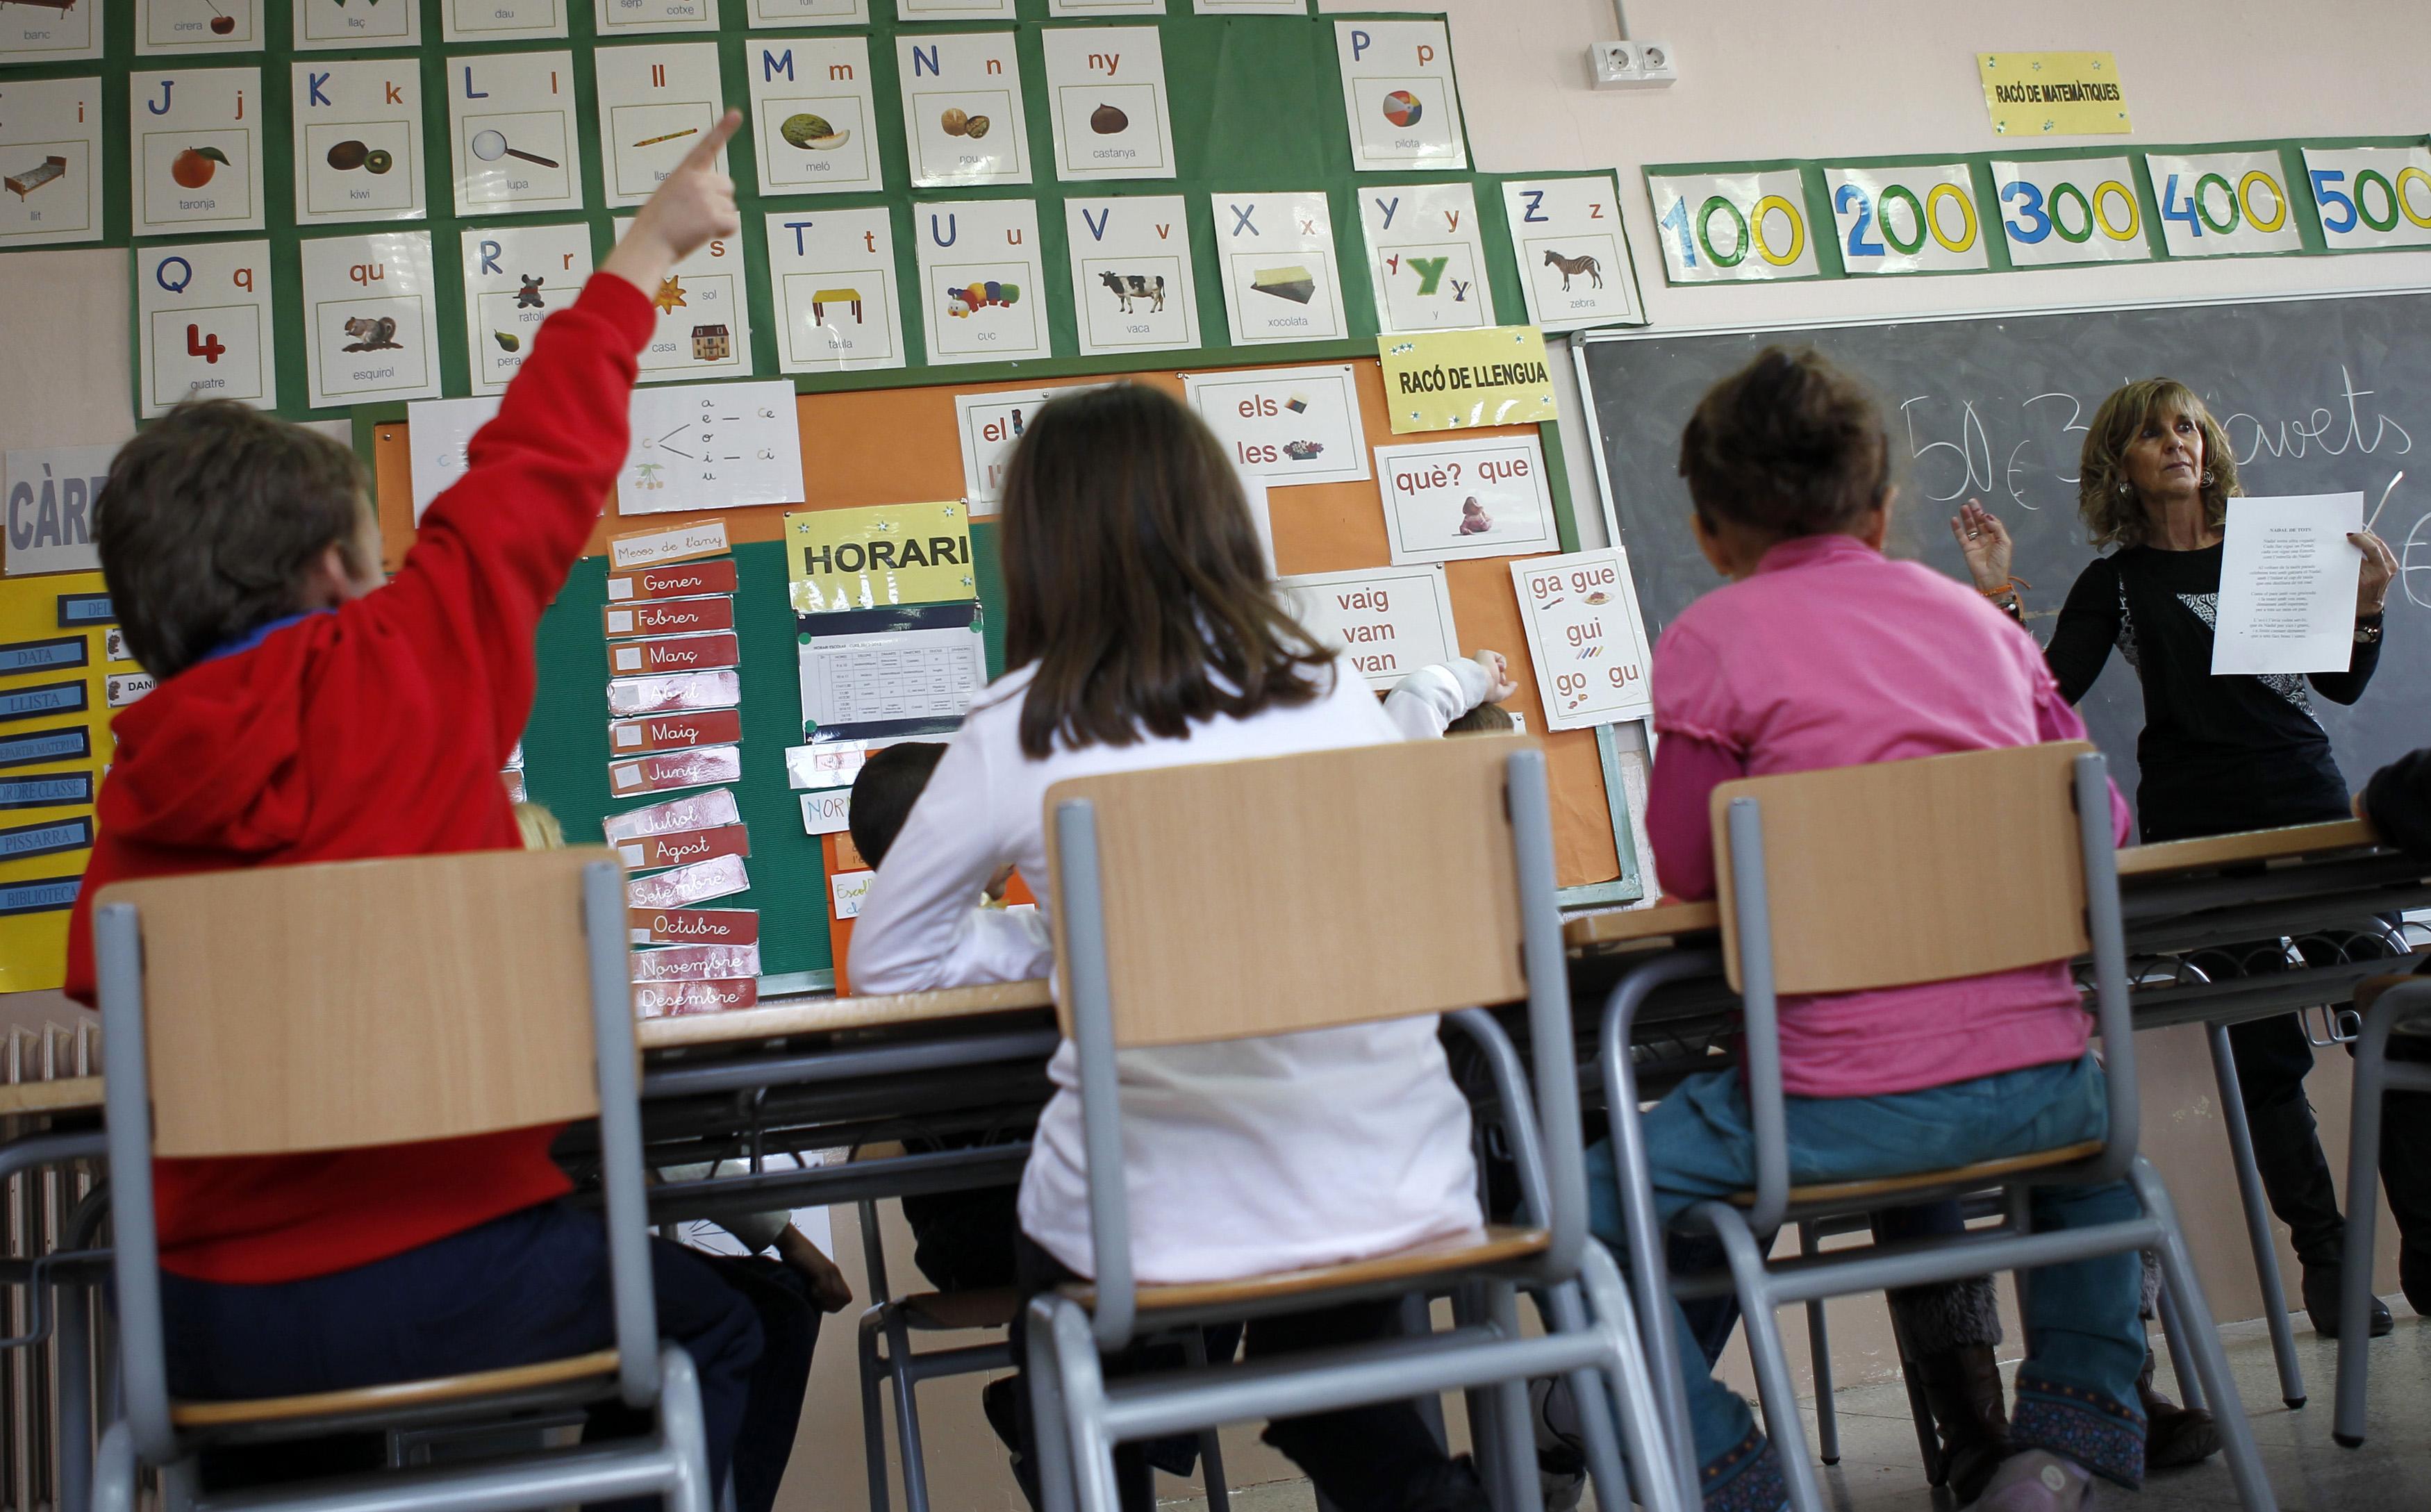 Escuela FOTO: Reuters